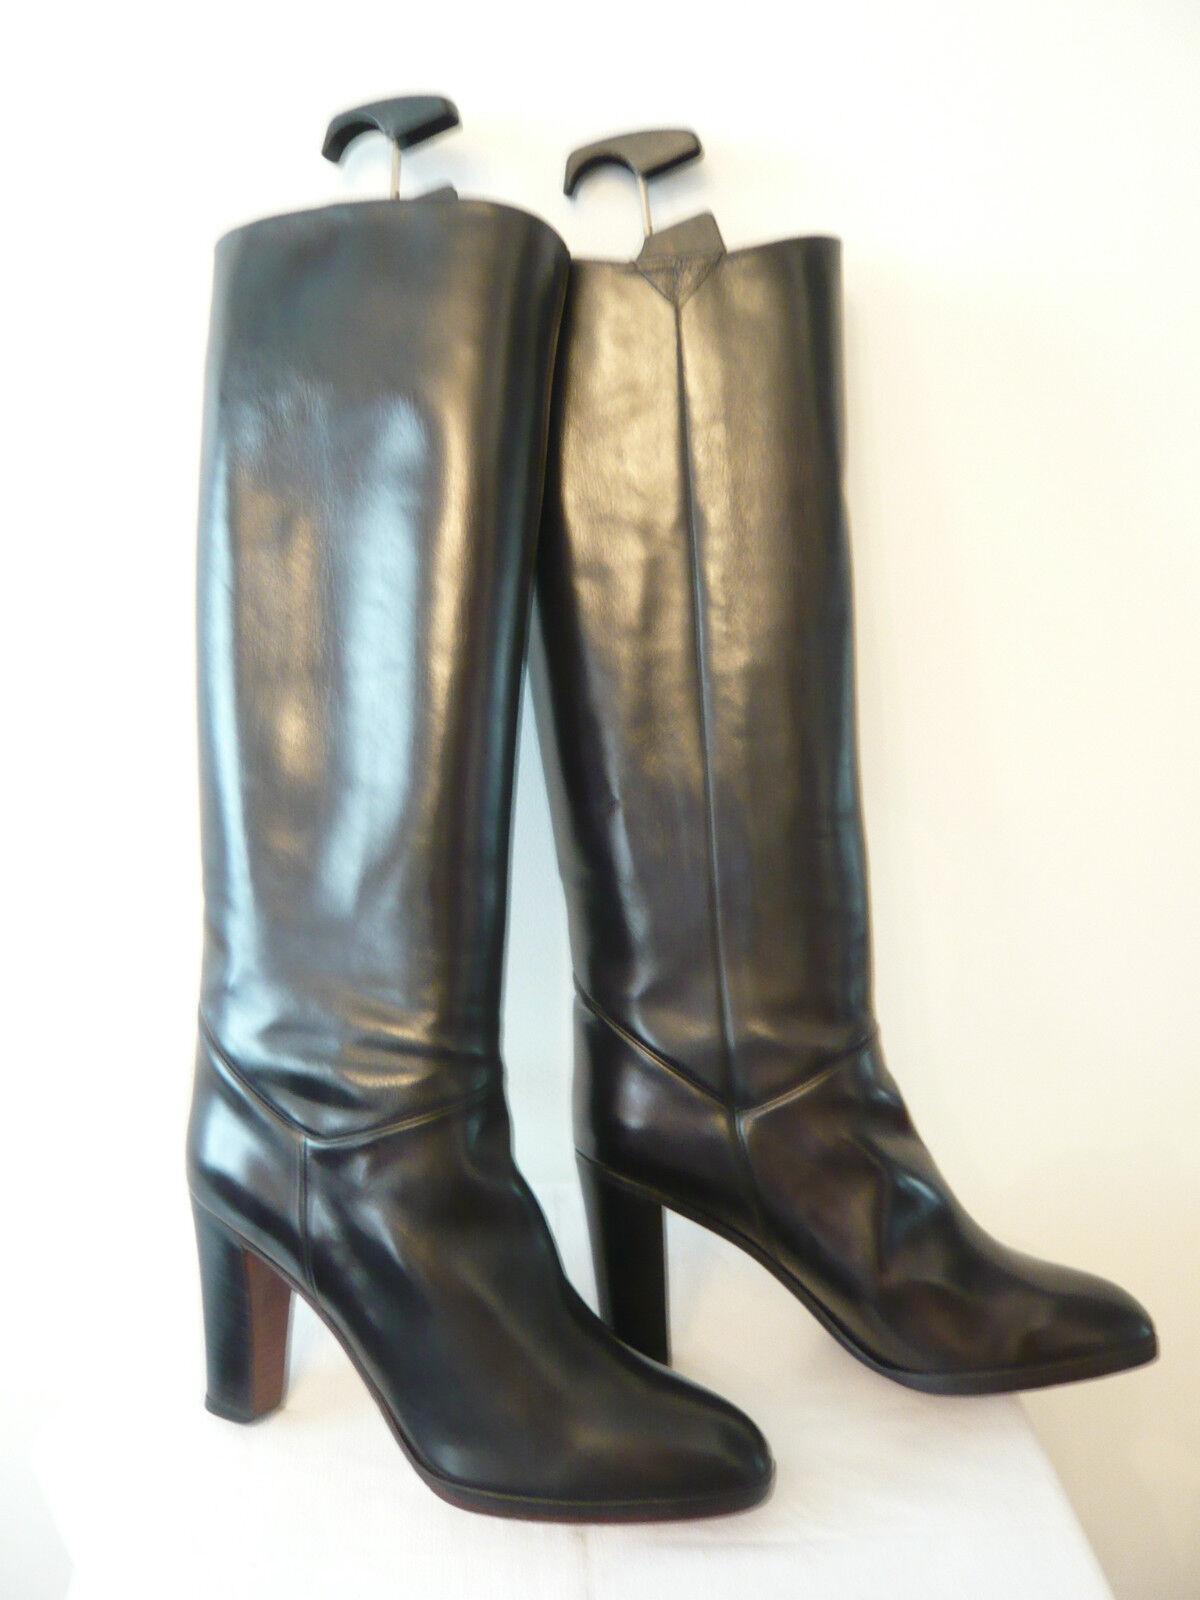 Boots Vintage  Black  - STEPHANE KELIAN (Predo) T. 7,5 (40)